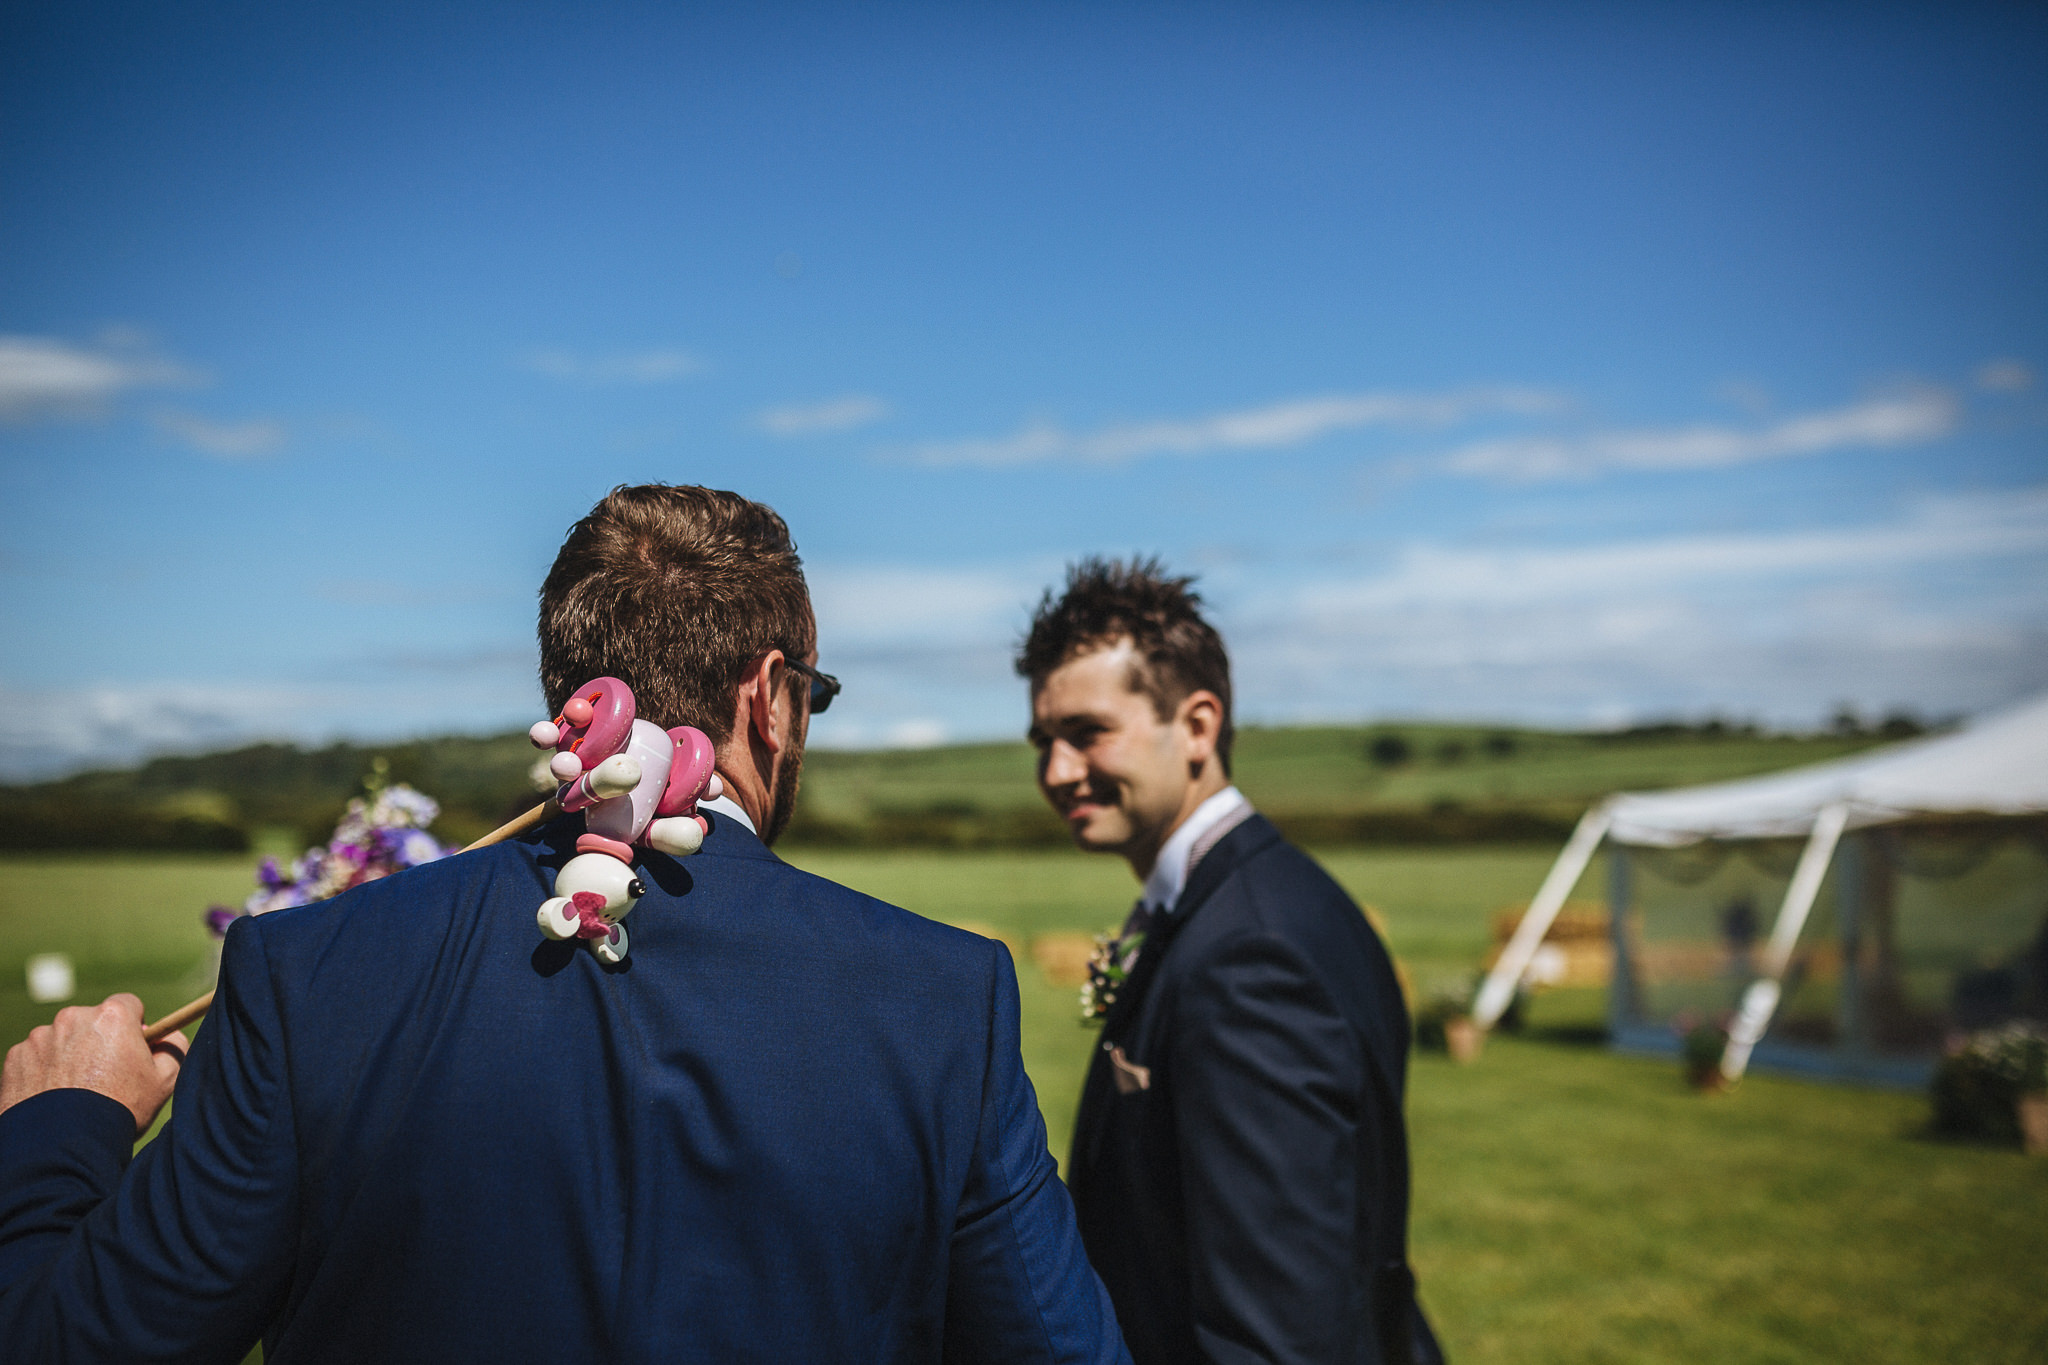 paul-marbrook-Farm-Wedding-Photographer-Lancashire-90051